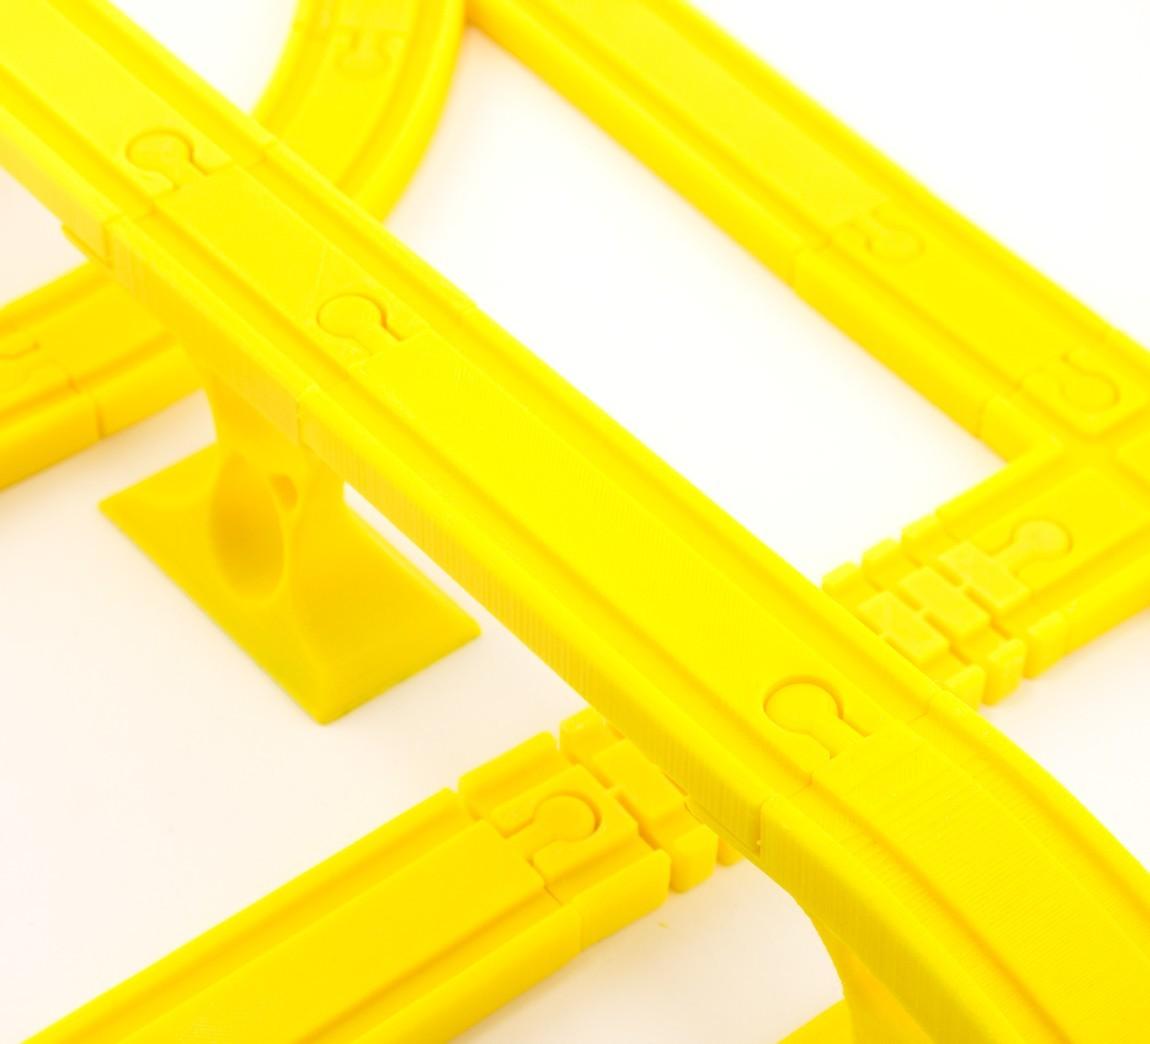 91cb4f62ceb4627f4039d91b0e40adb8_1449686541514_12.2.15-product-shoot-024.jpg Download free STL file Toy Train Tracks • 3D printer design, FerryTeacher